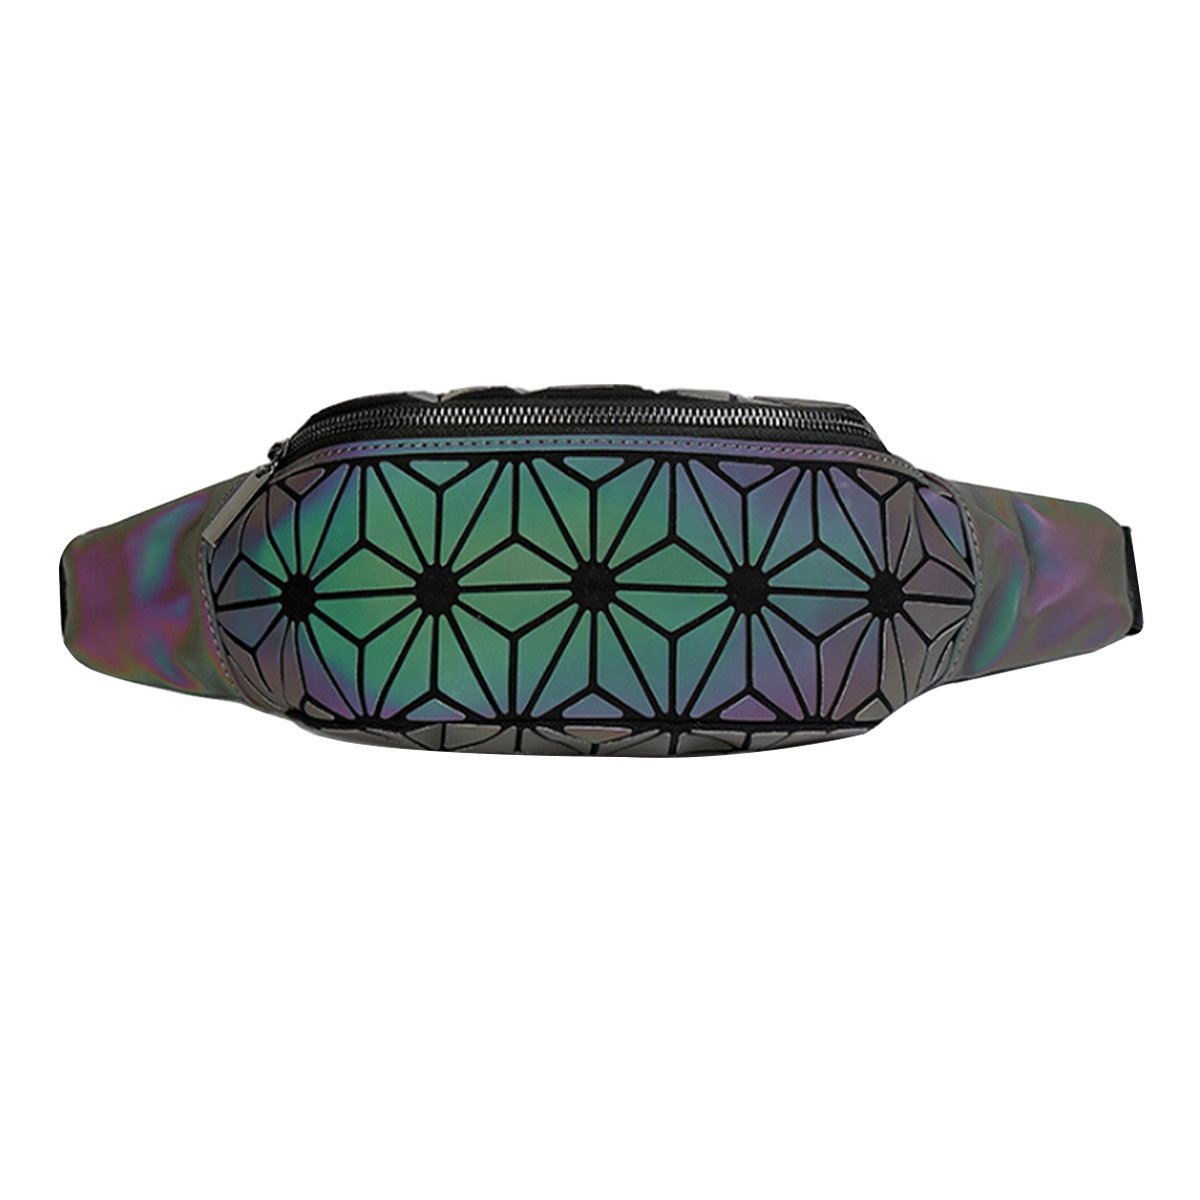 Triangle Sherry Waist Bag Geometric Luminous Fanny Pack Waist Pack Chest Bag Sport Outdoor Travel Bum Bag for Women